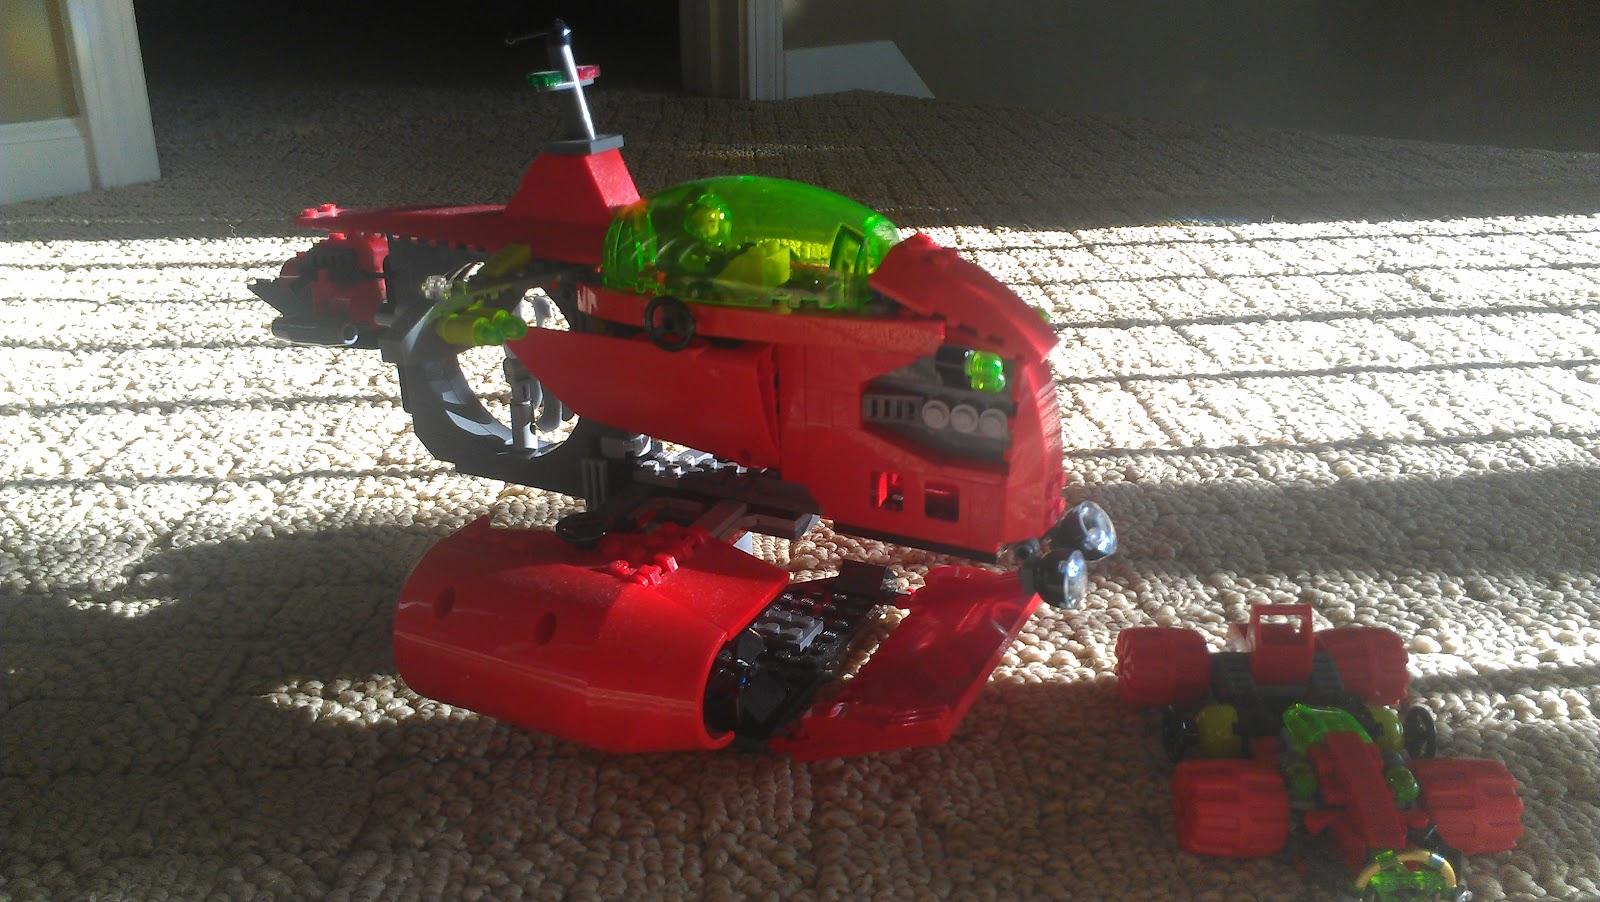 2014-08-26-legos.jpg